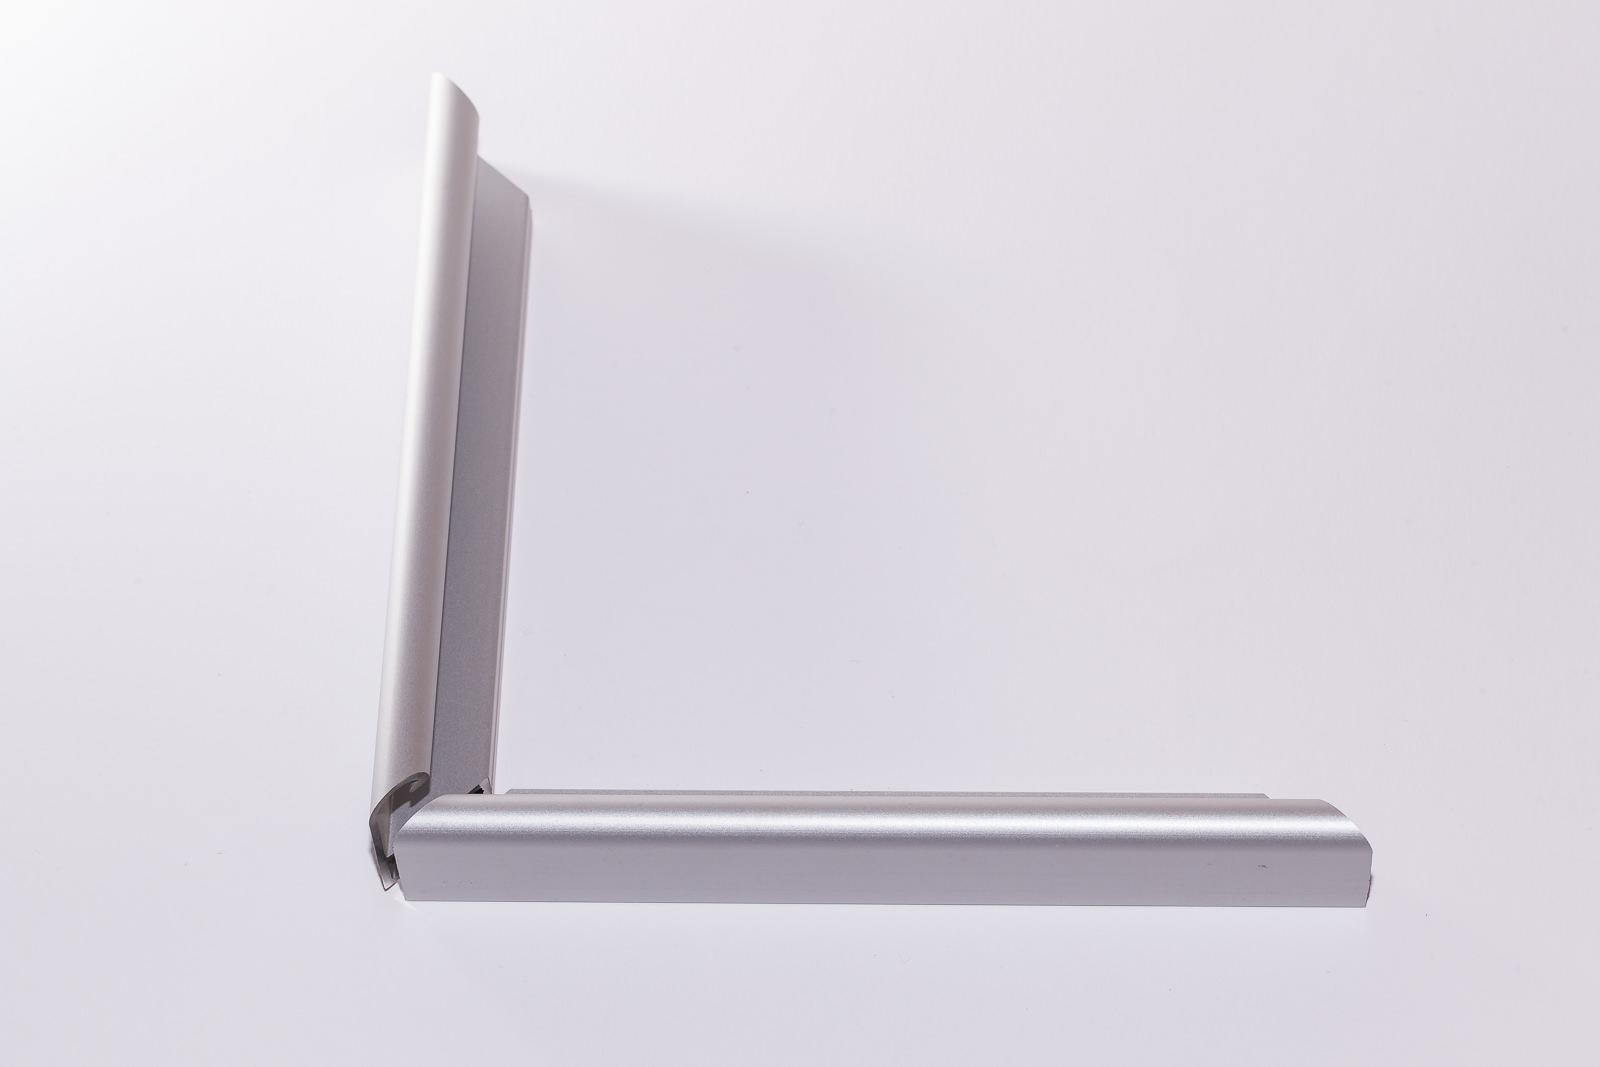 FCO 223 Aluminium-Wechselrahmen-Profil